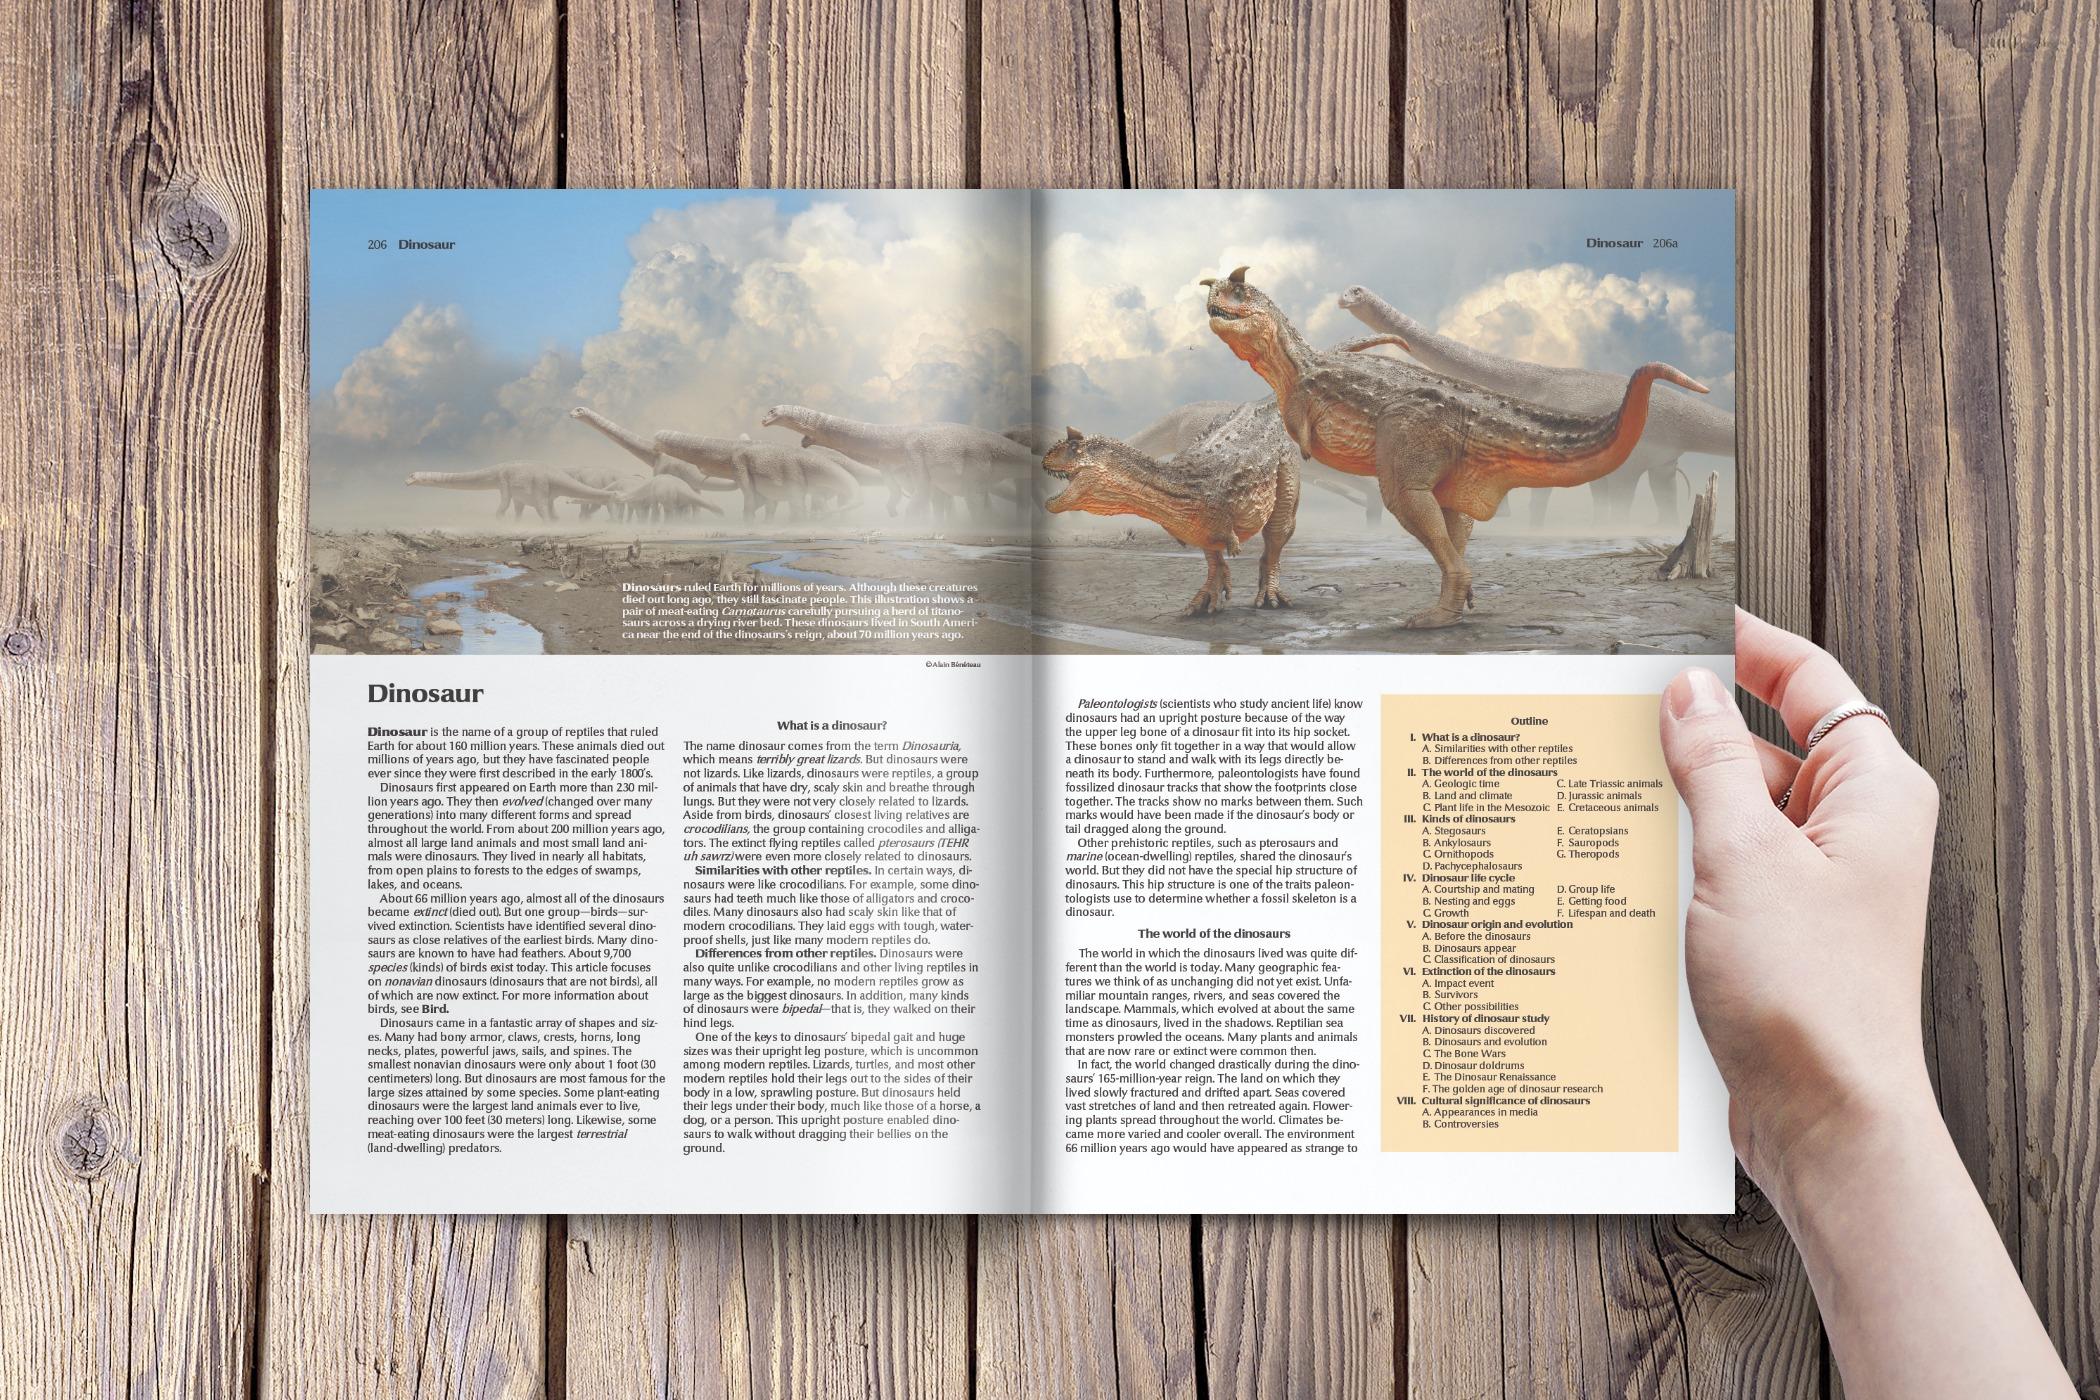 The World Book Encyclopedia-Dinosaur Article.